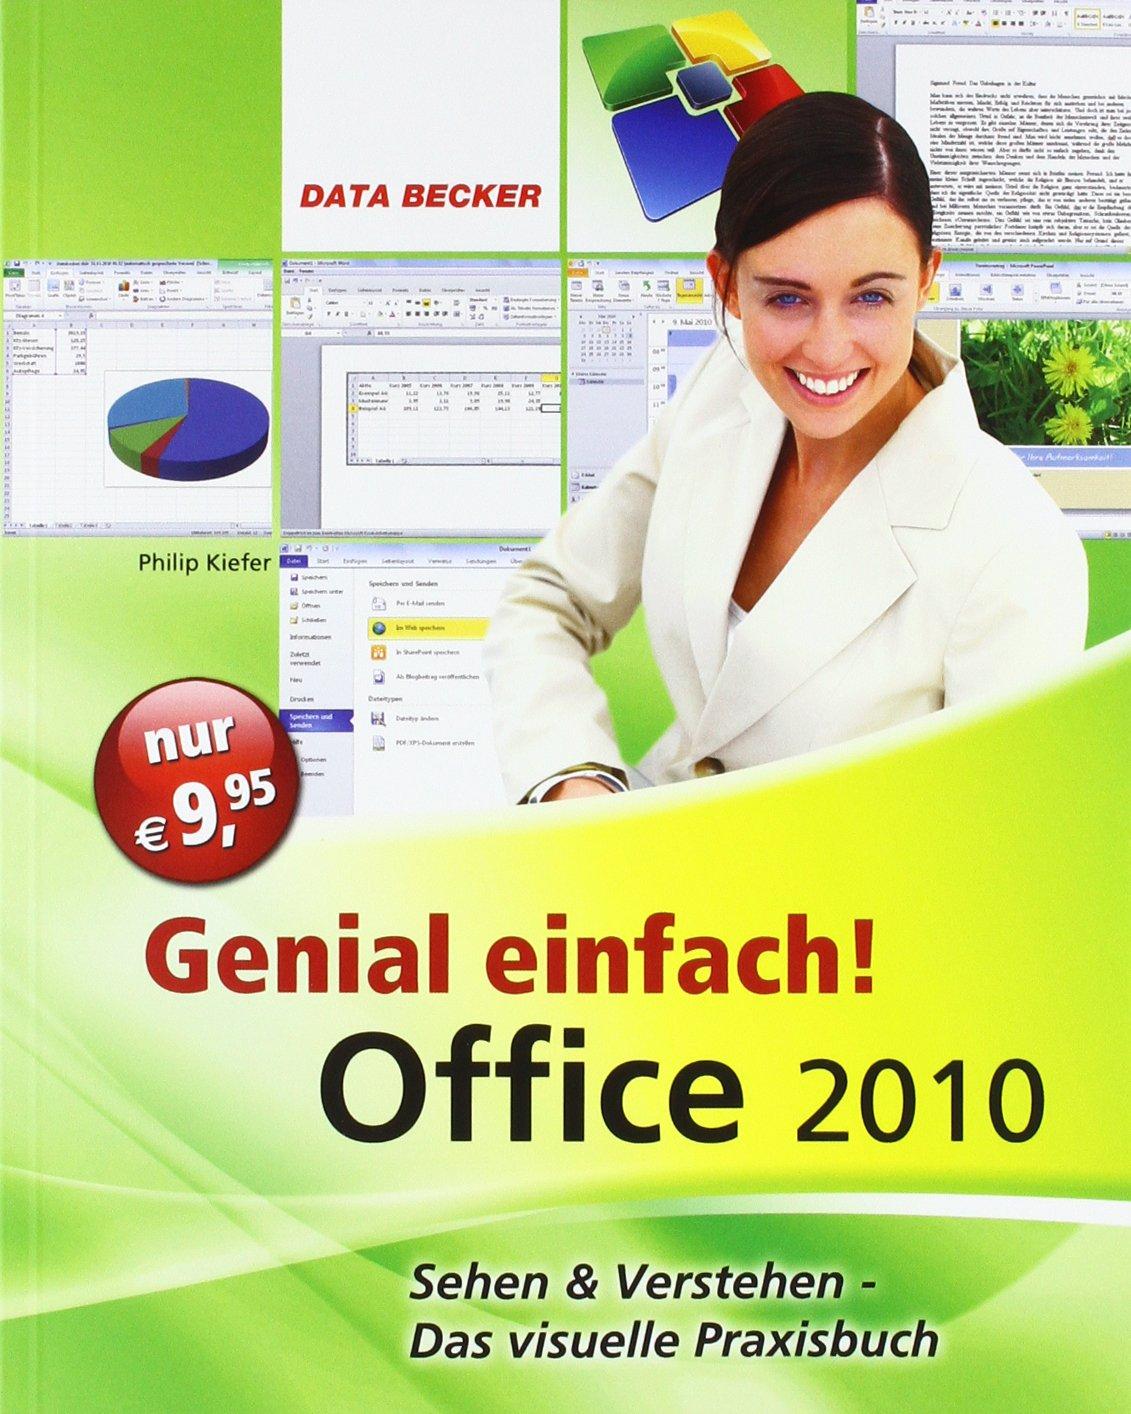 Genial einfach: Office 2010